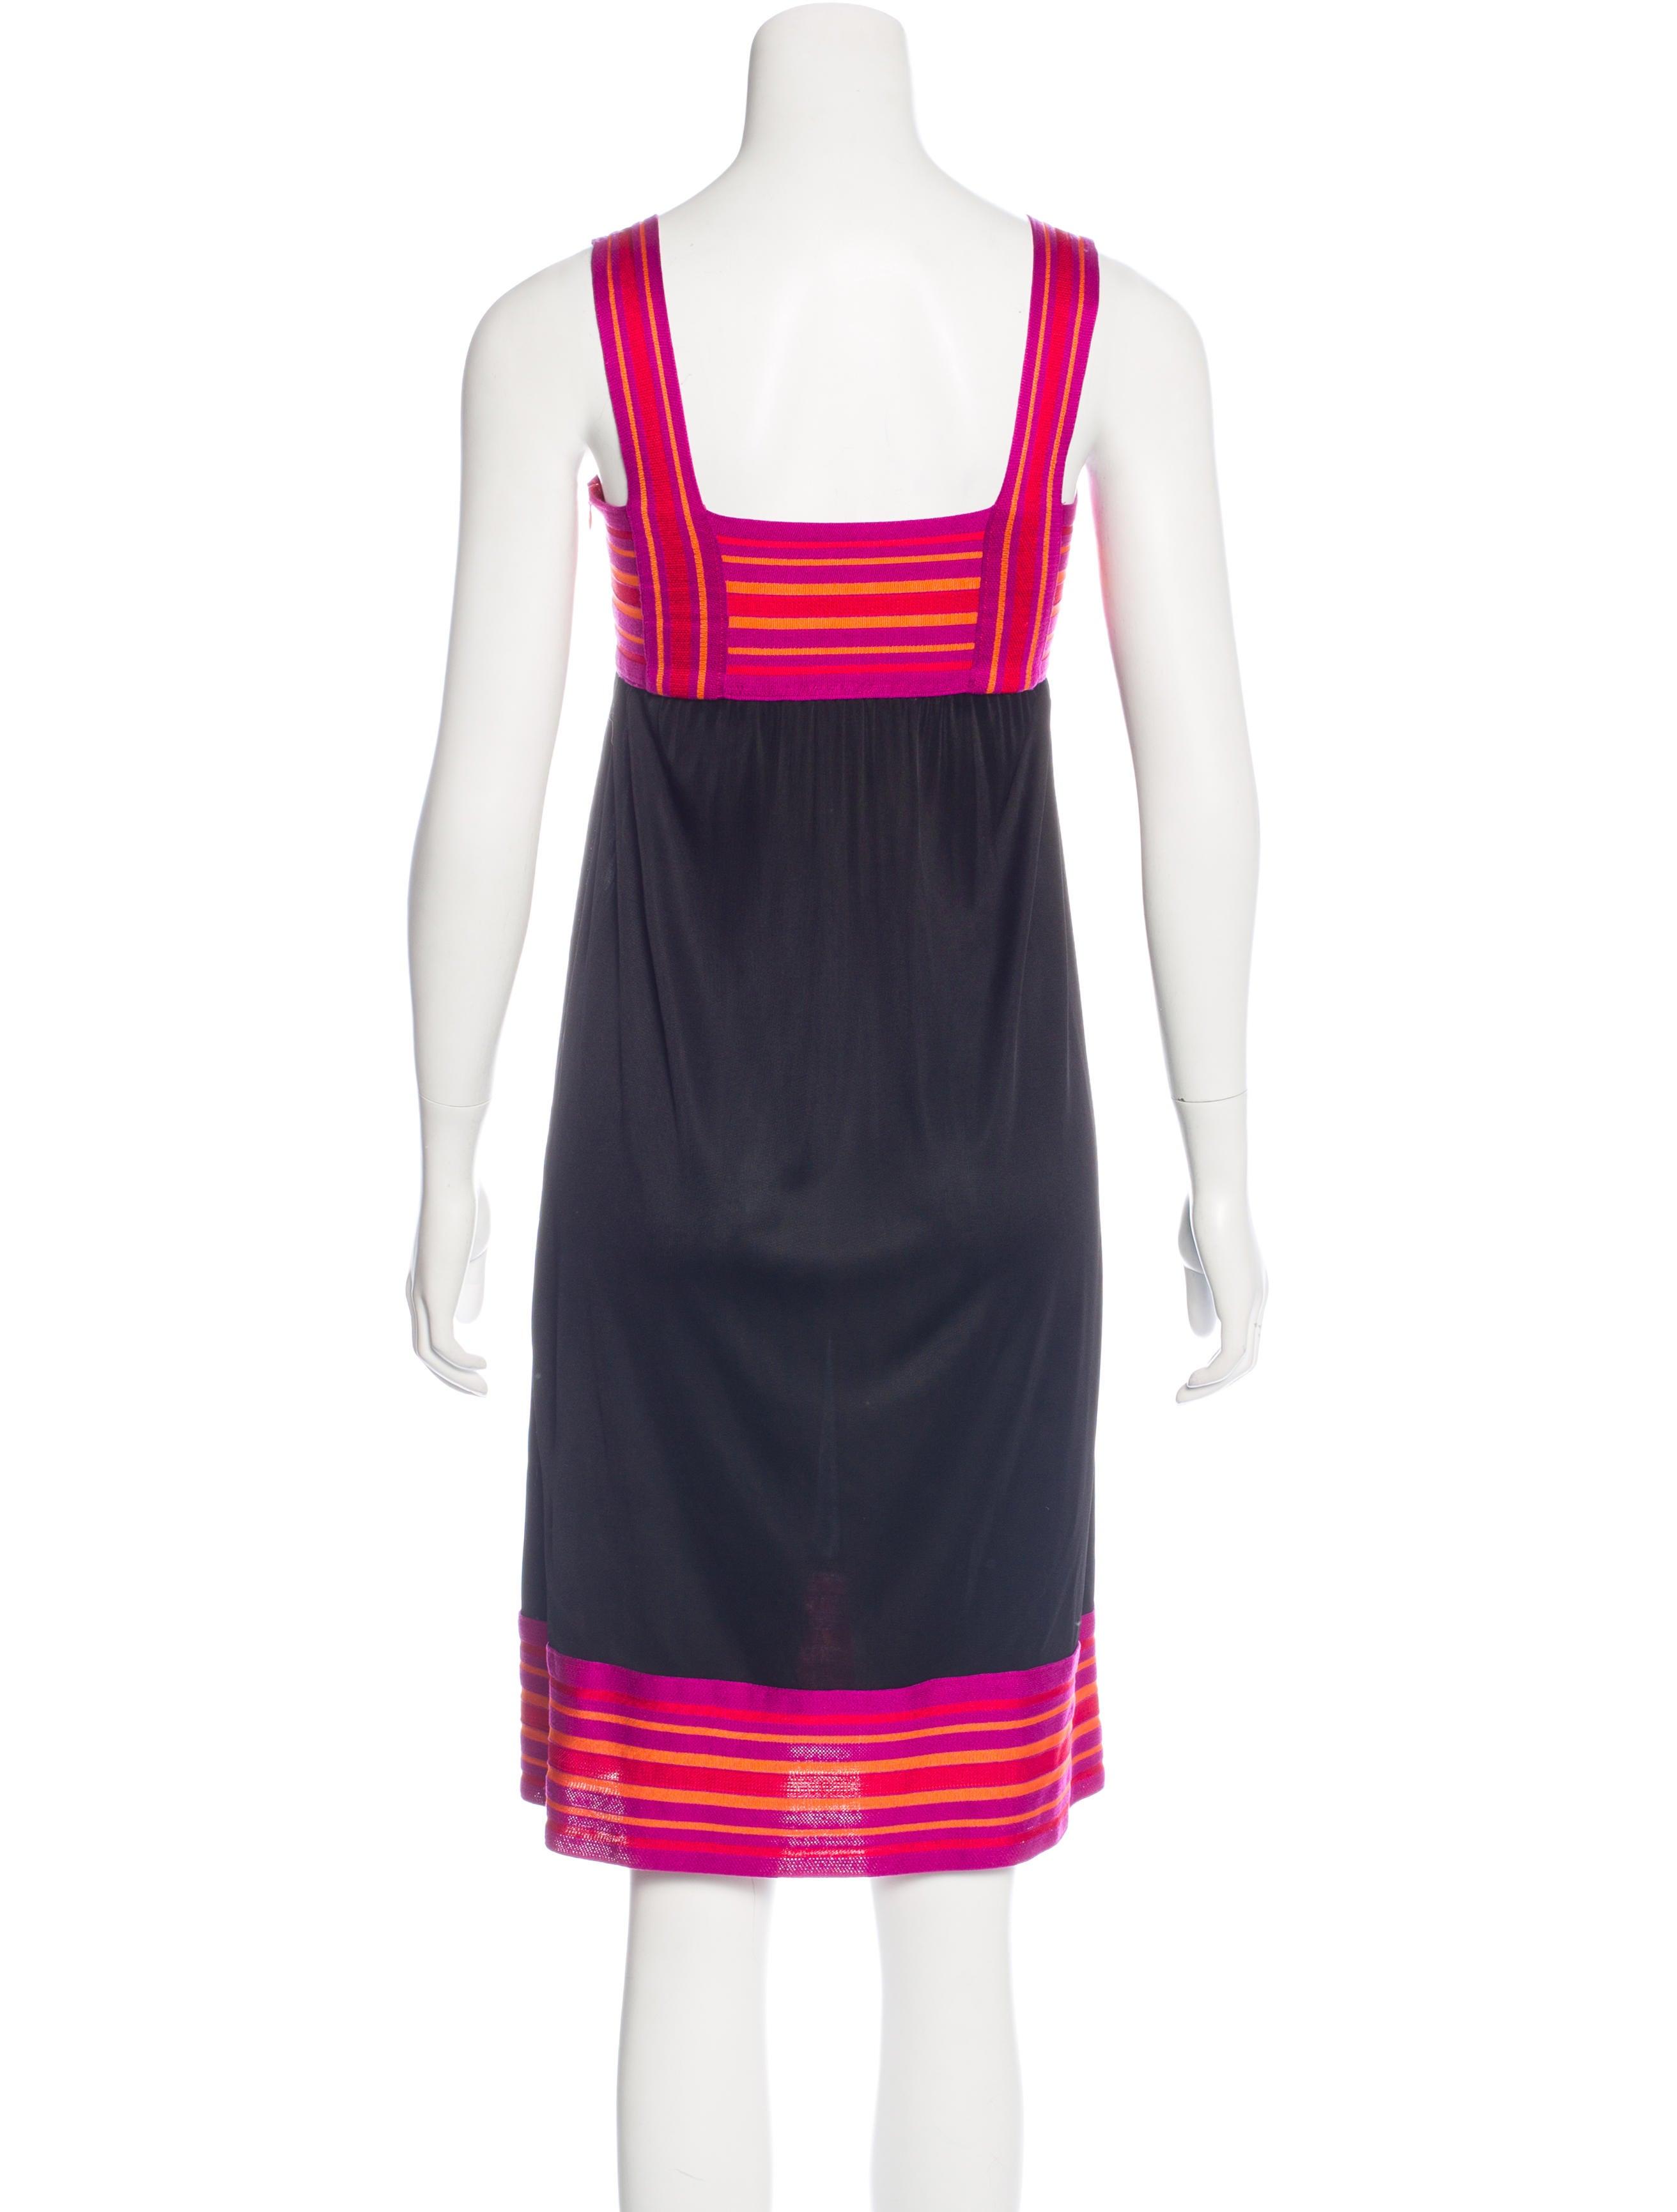 m missoni knit midi dress clothing wm439942 the realreal. Black Bedroom Furniture Sets. Home Design Ideas